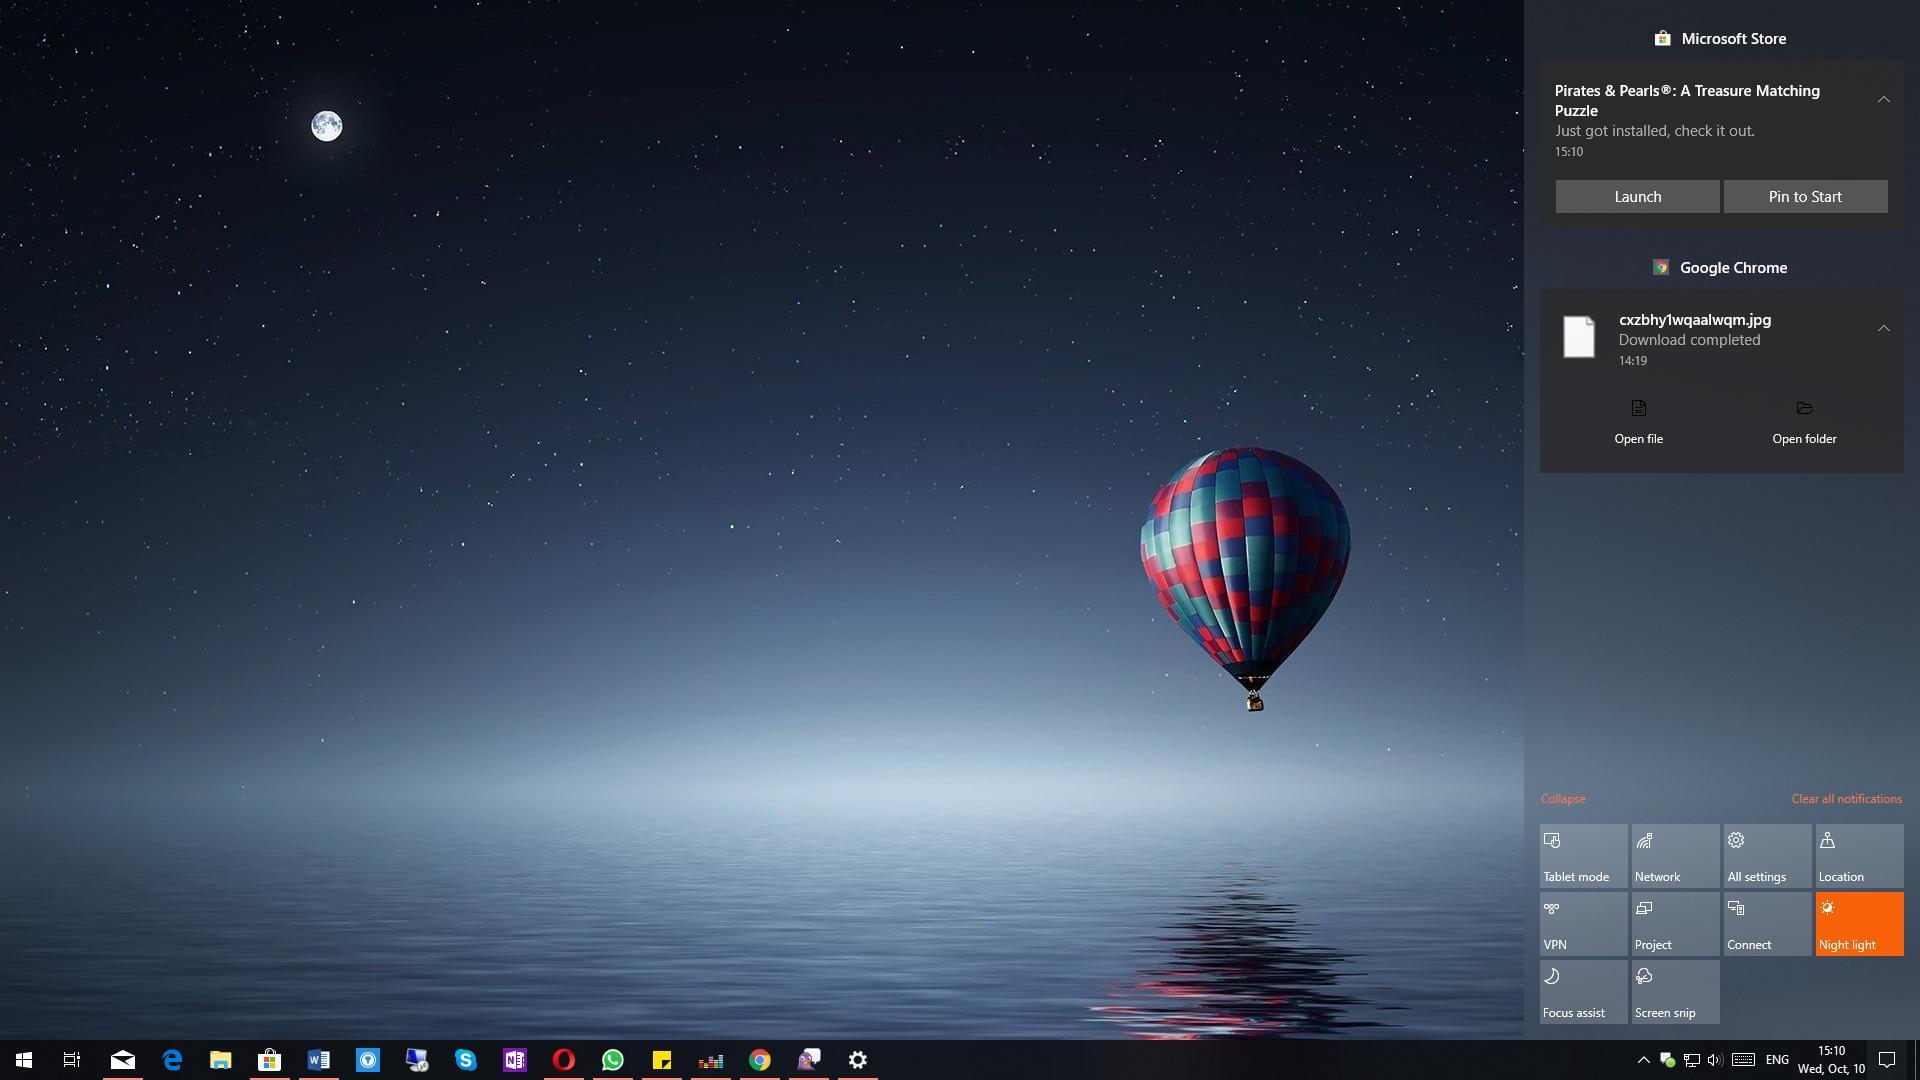 How to Fix Windows 10 Version 1809 Bug Blocking Notifications